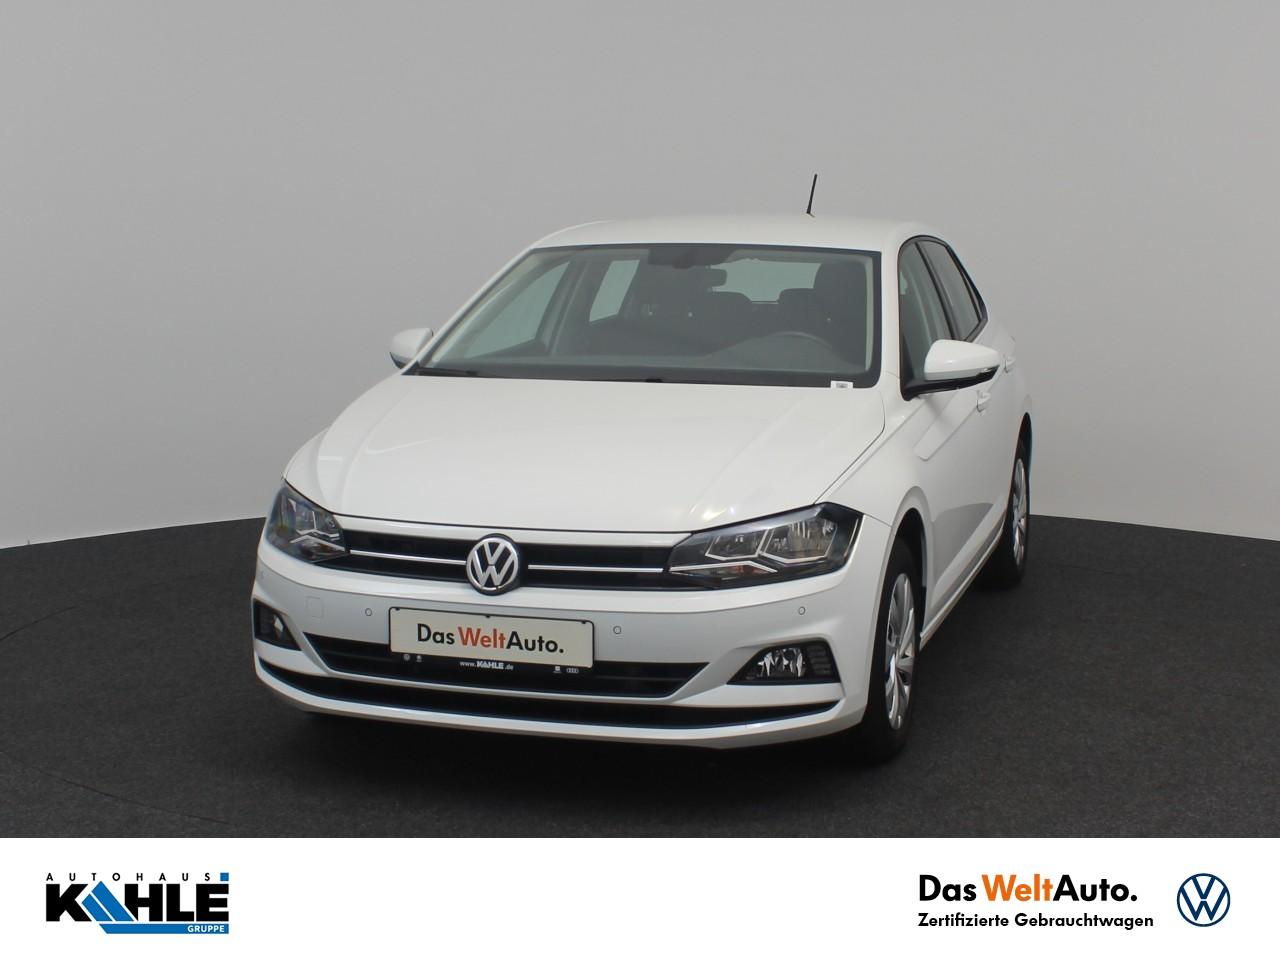 Volkswagen Polo 1.0 TGI Comfortline Navi Klima Sitzh. PDC, Jahr 2020, Benzin